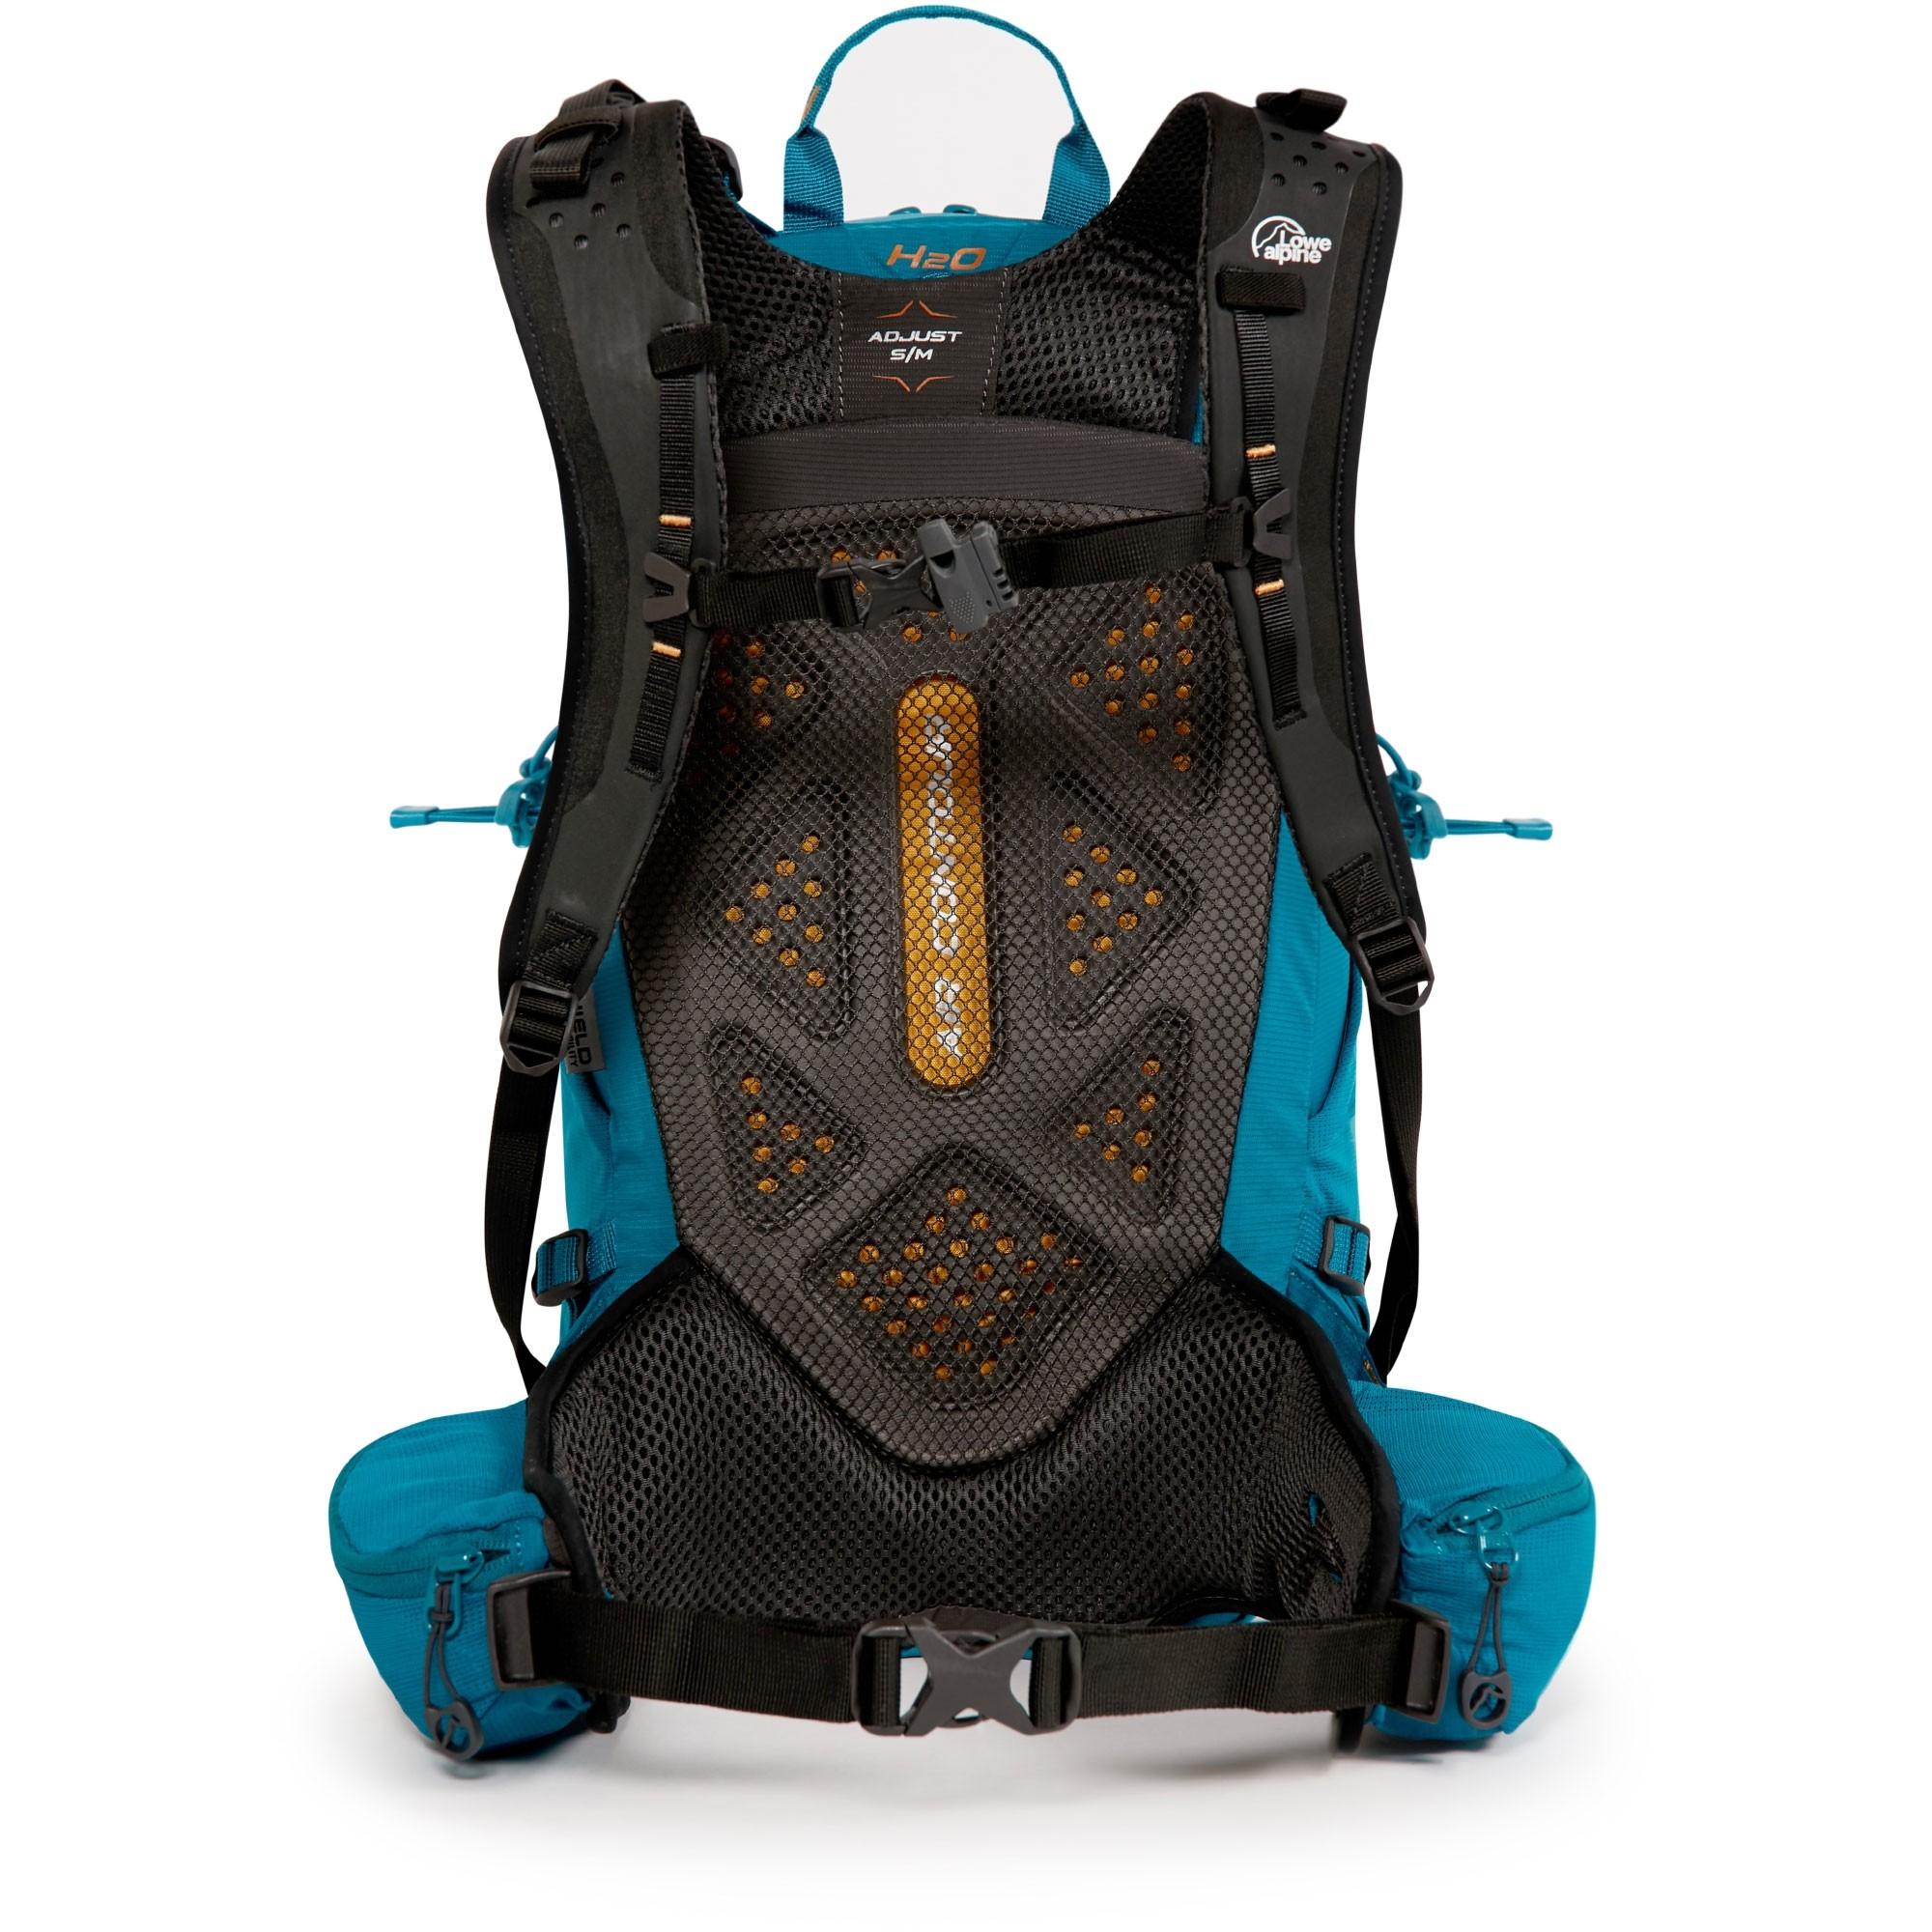 Lowe Alpine Aeon ND16 Women's Rucksack - Lagoon Blue - back system